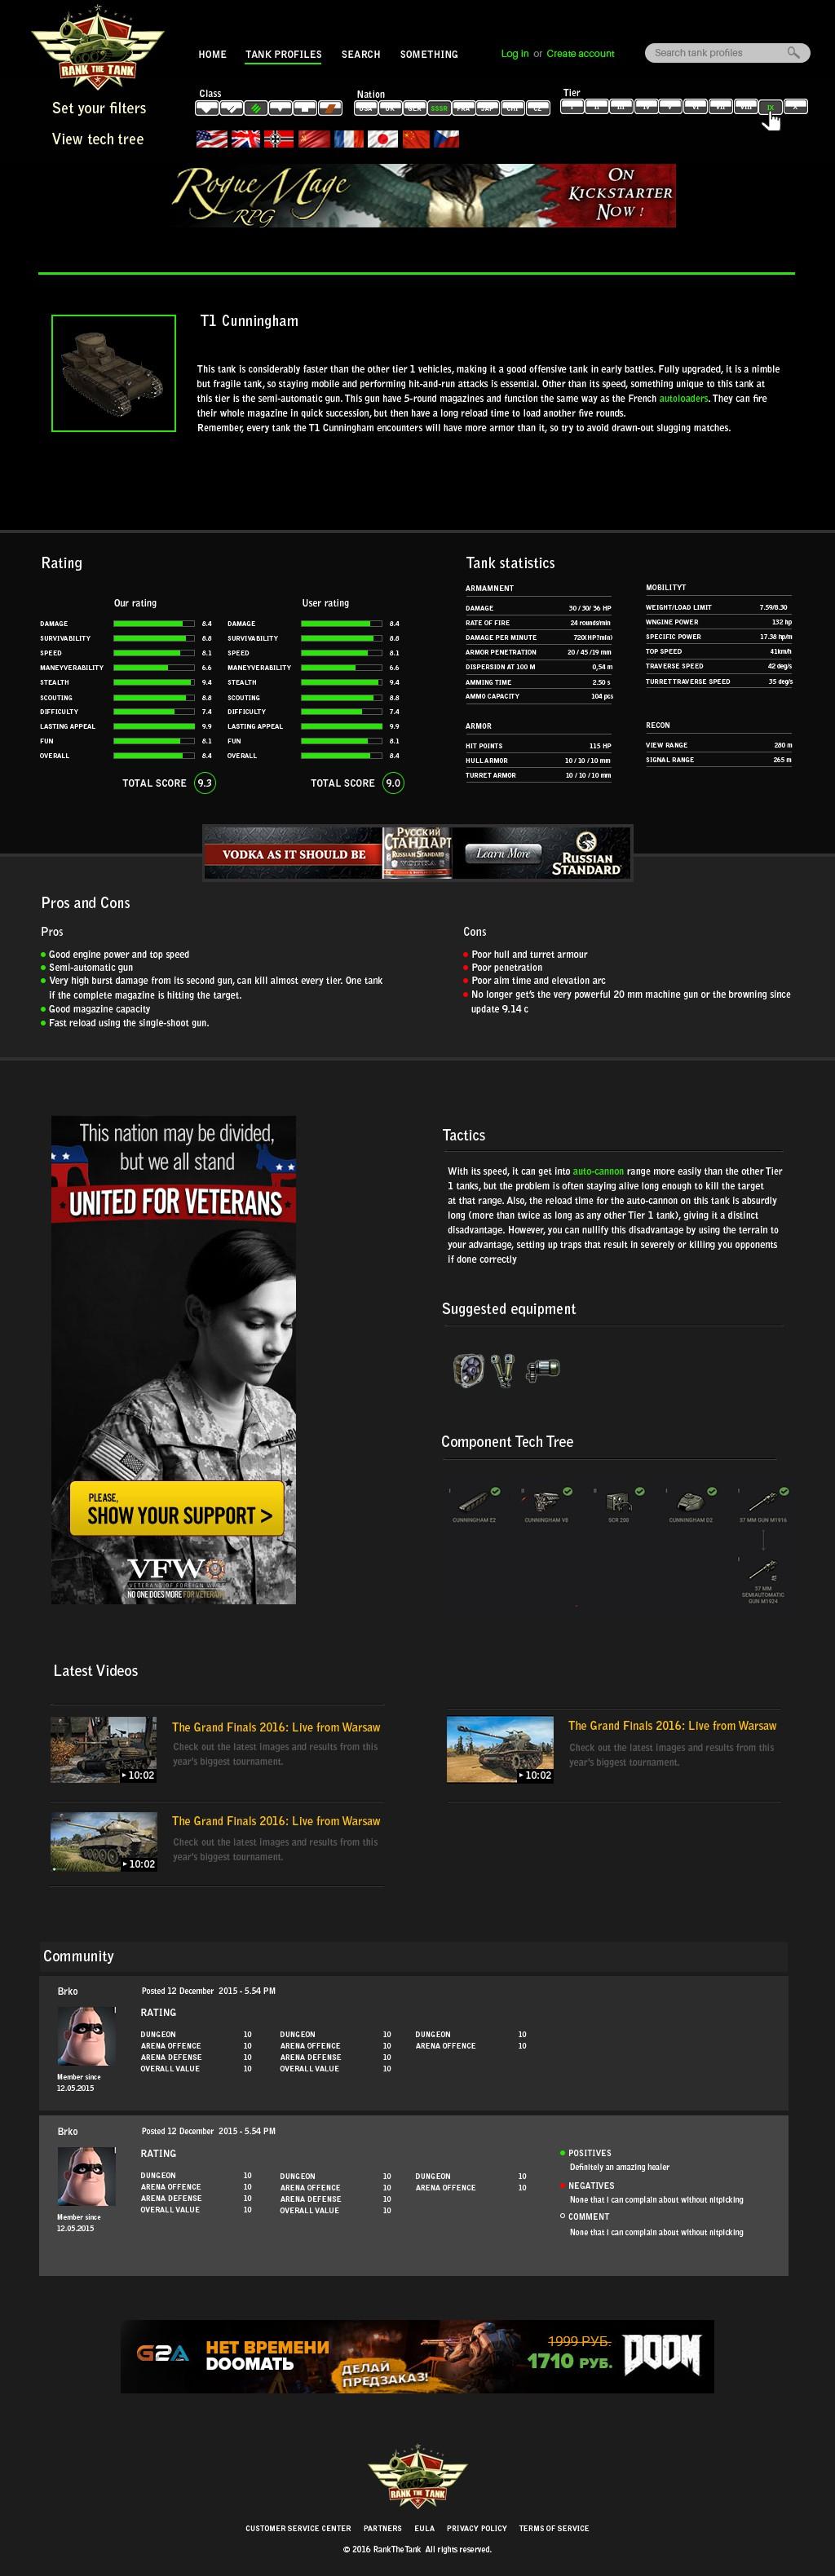 Tanks + Website = Profit